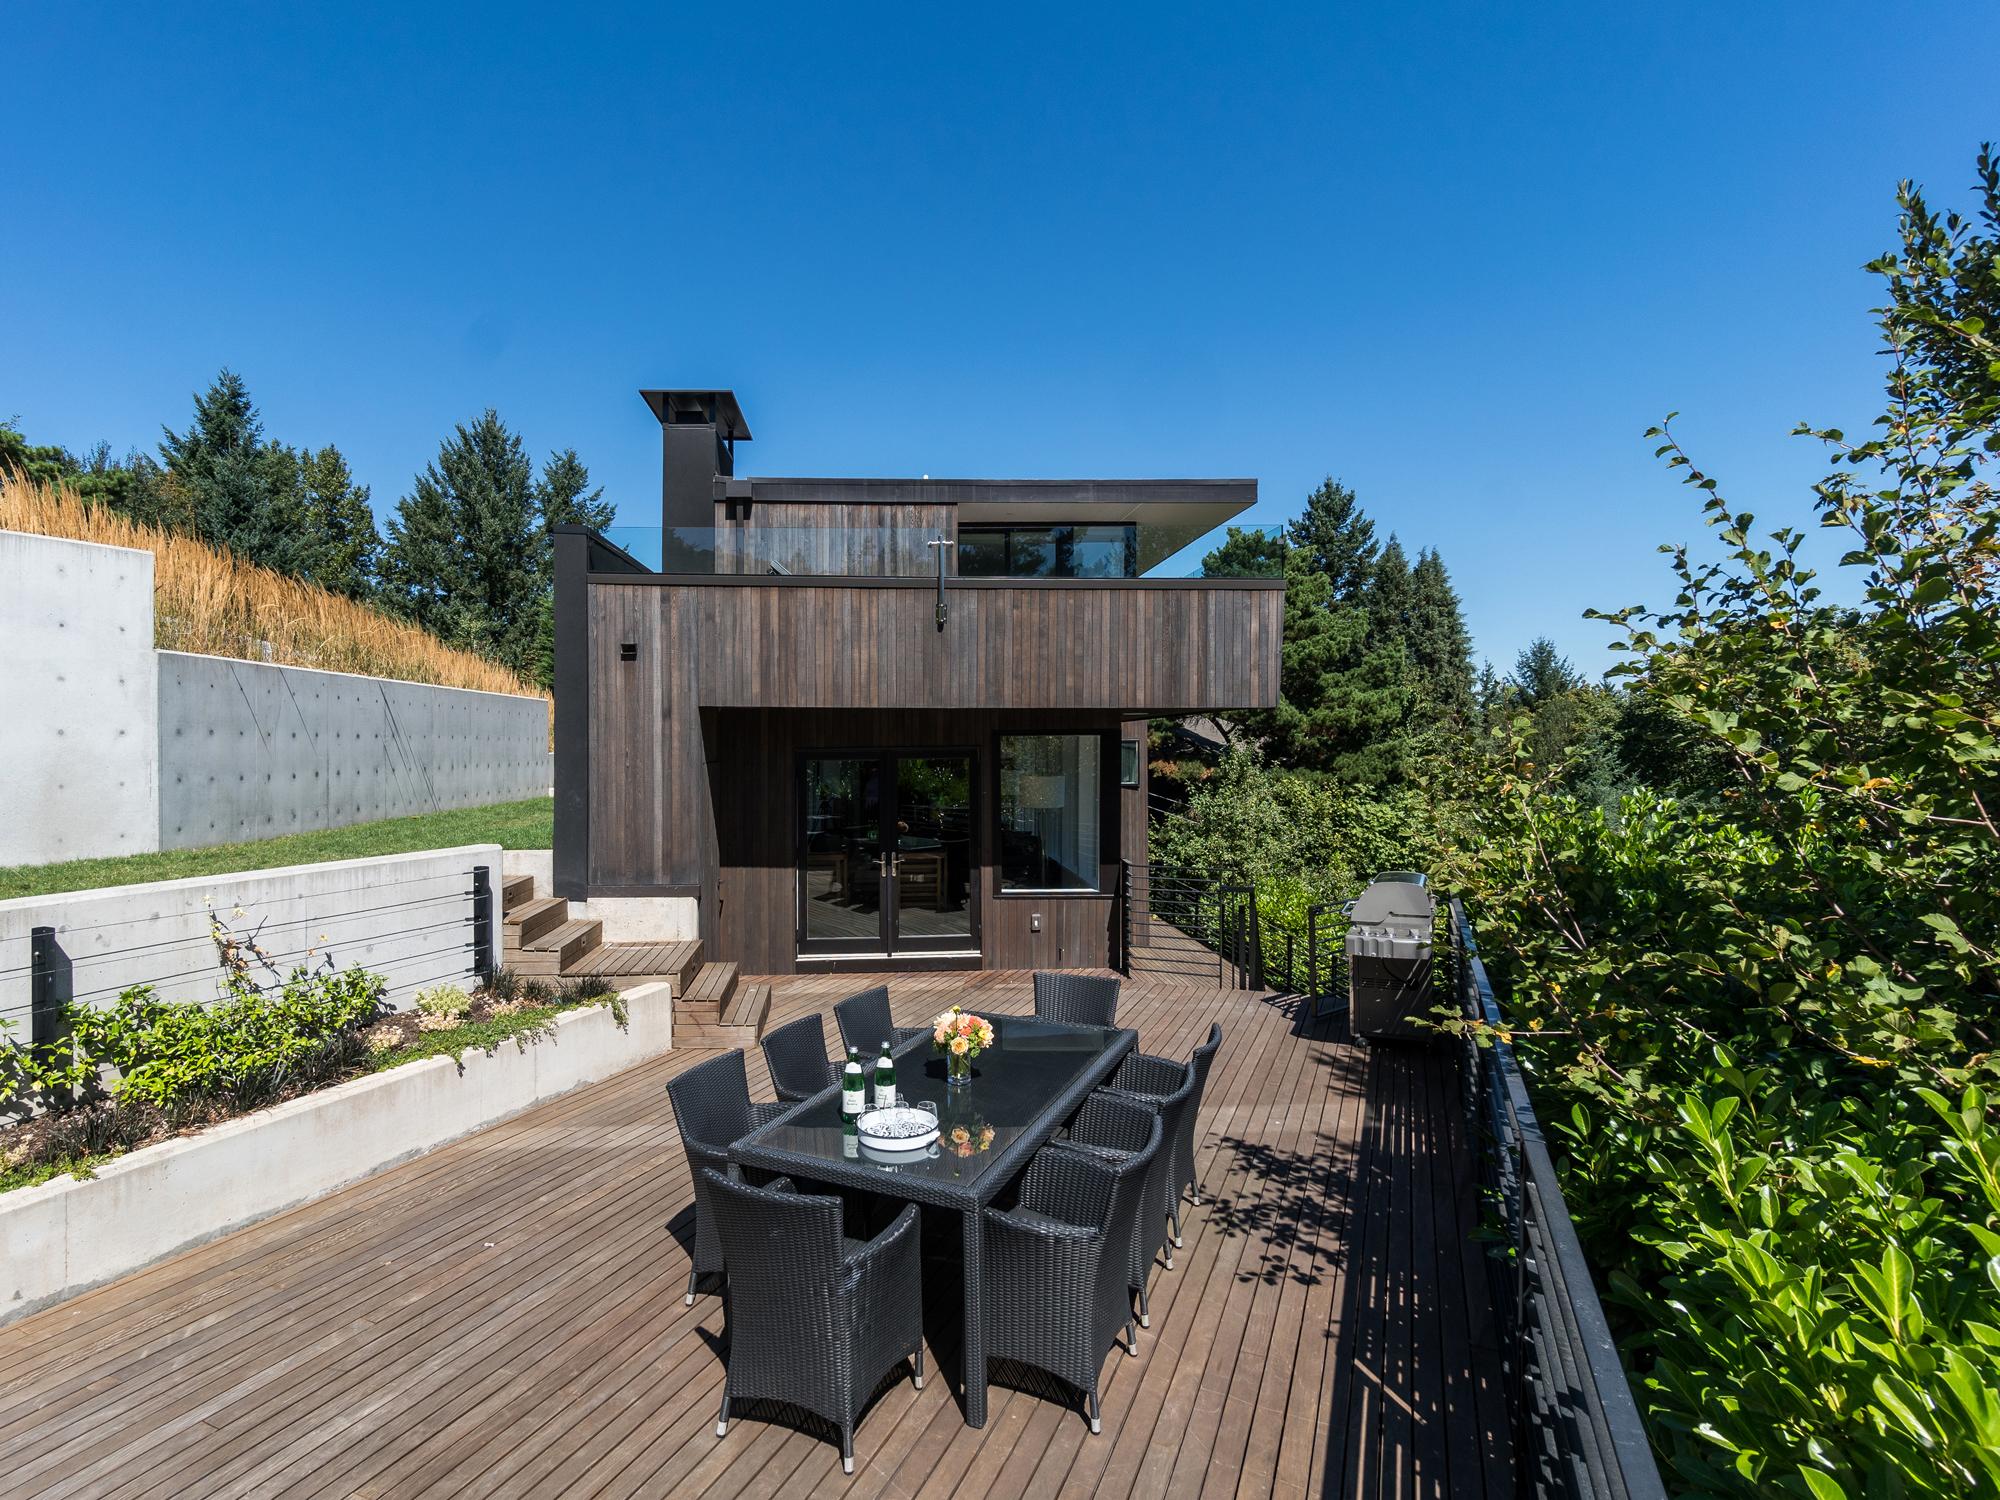 Van Evera Bailey Sinclair House by In Situ Architecture 10.jpg